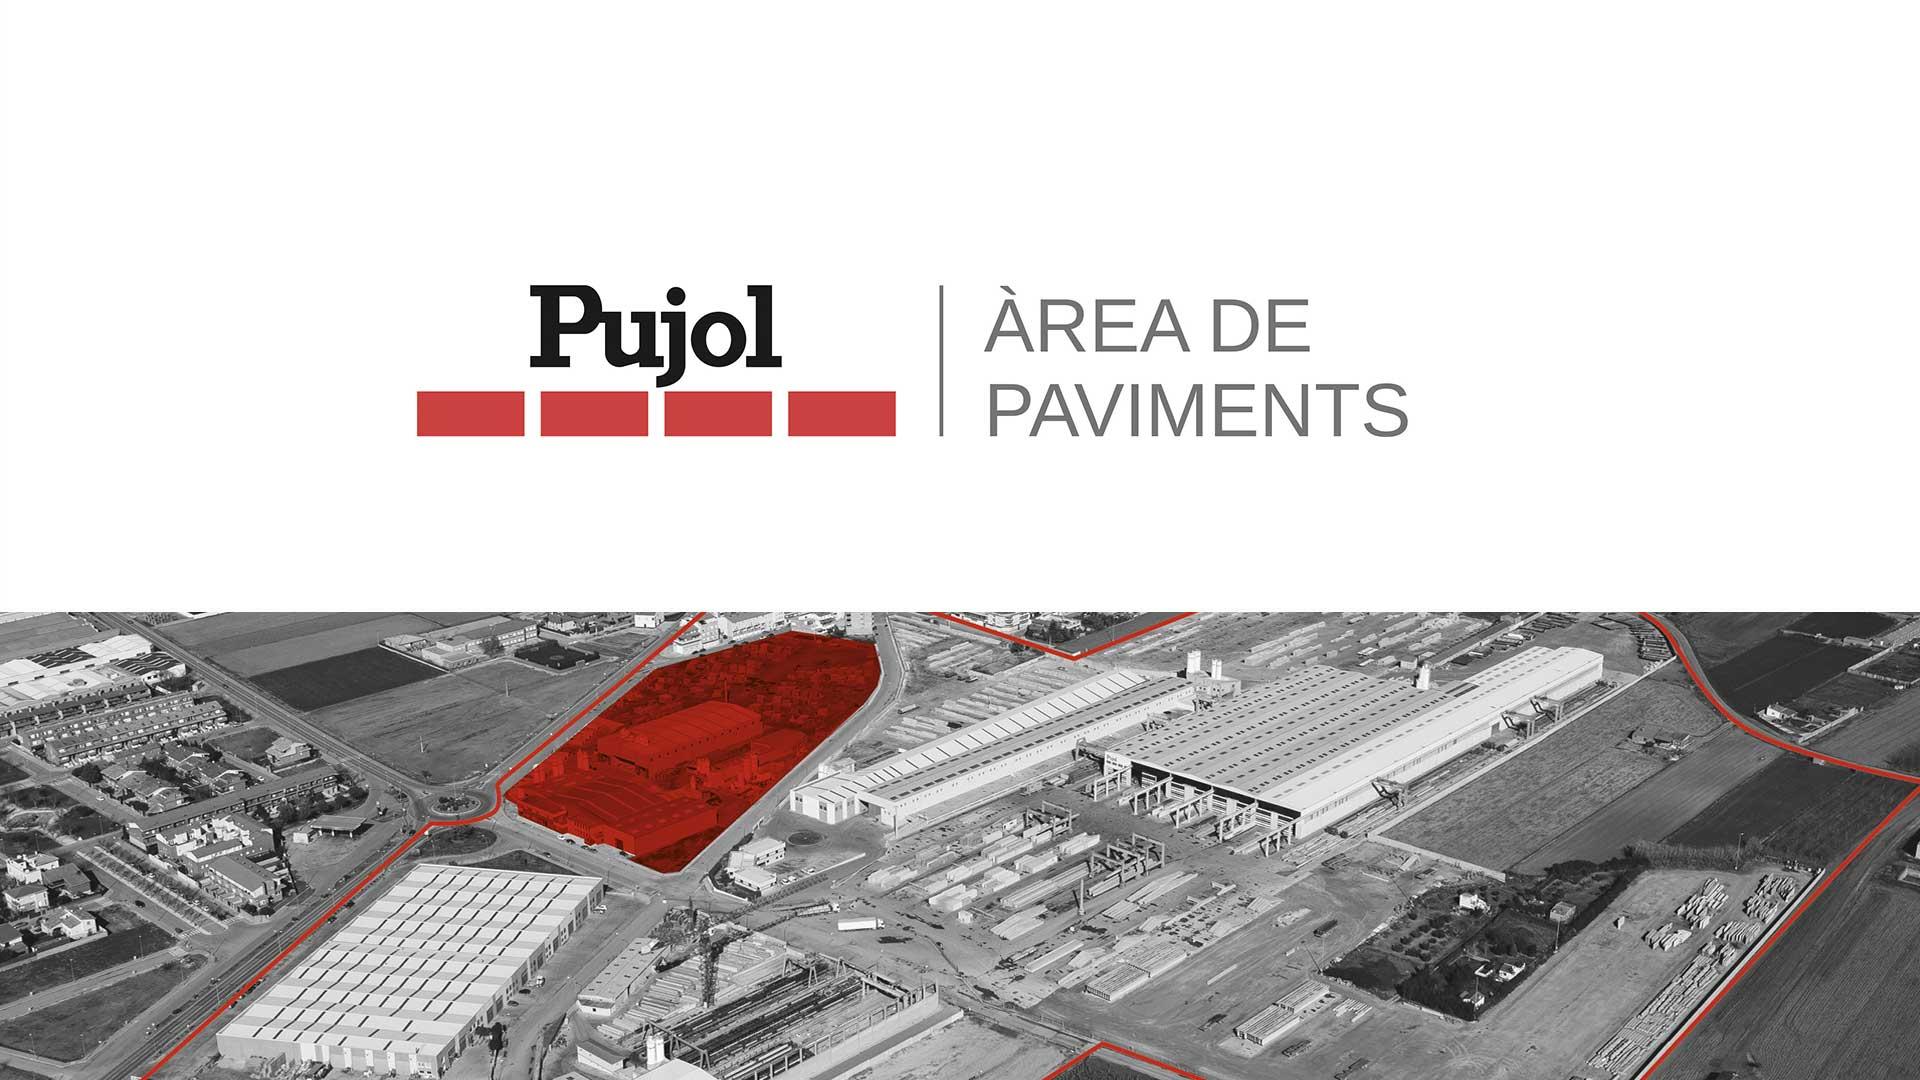 www.paviments.prefabricatspujol.com